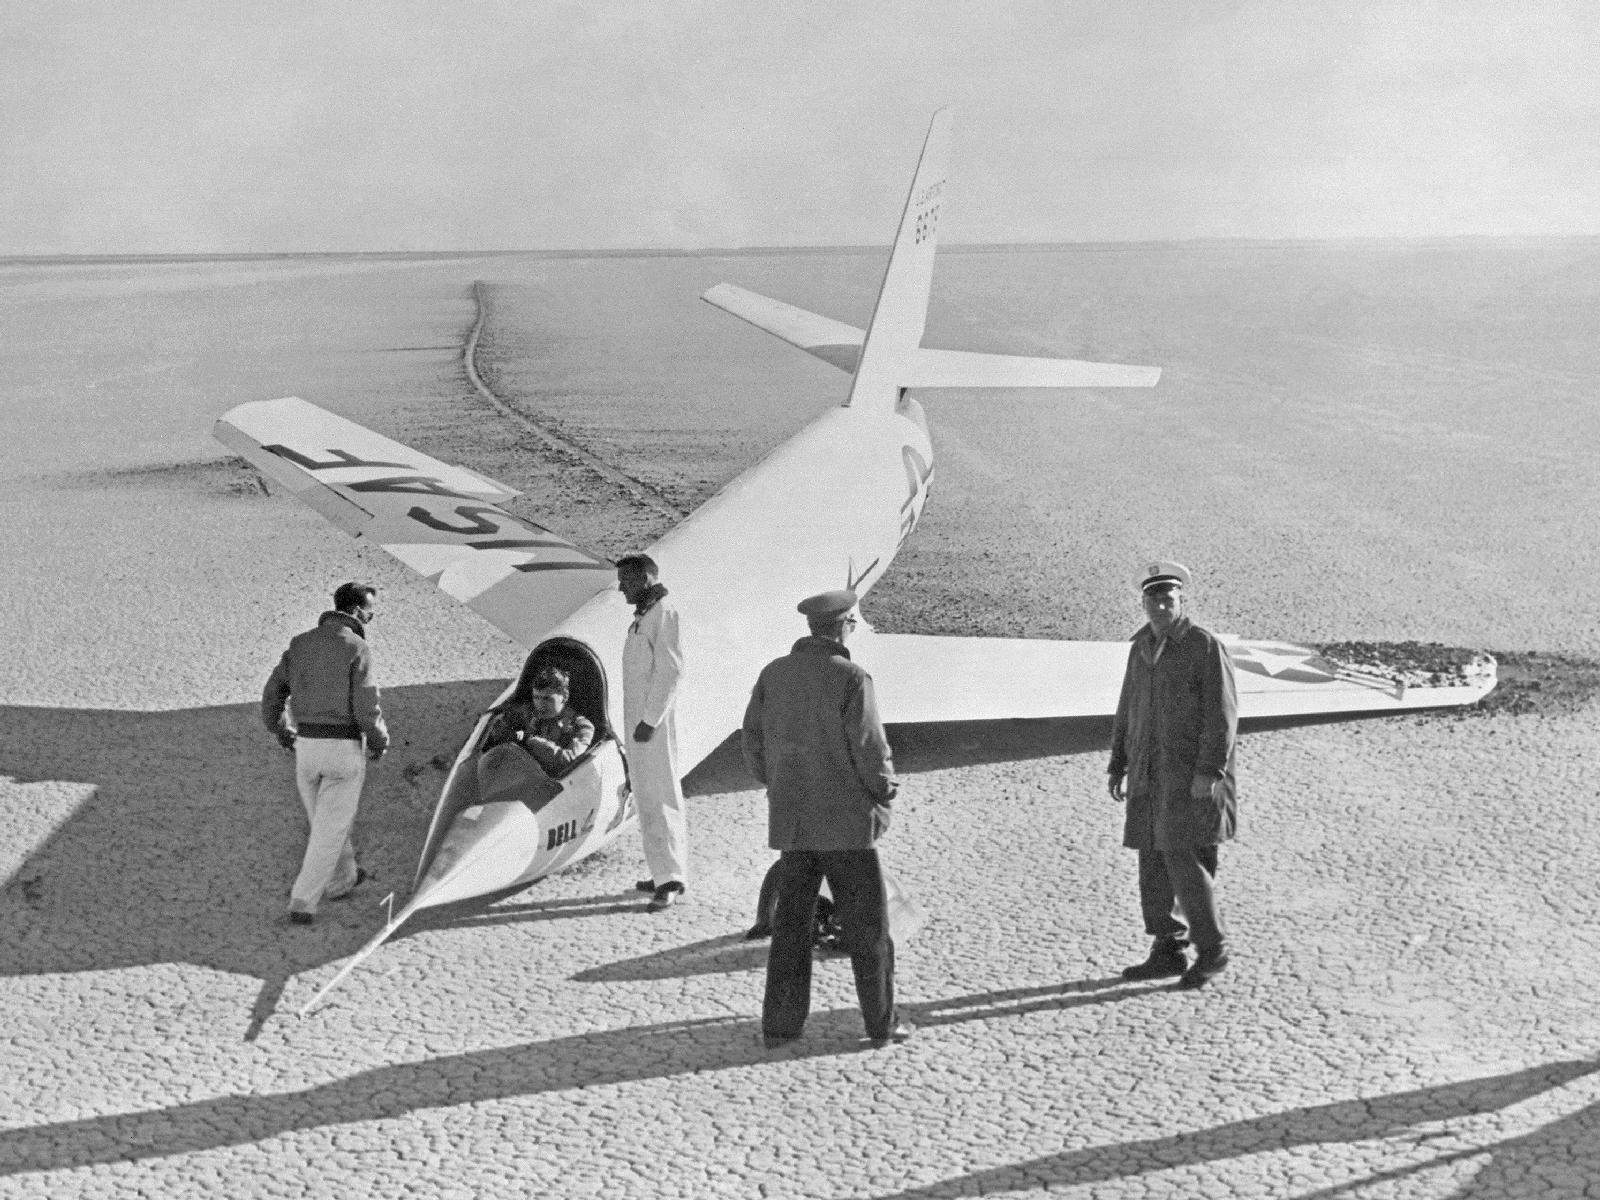 Plane crash, 1952